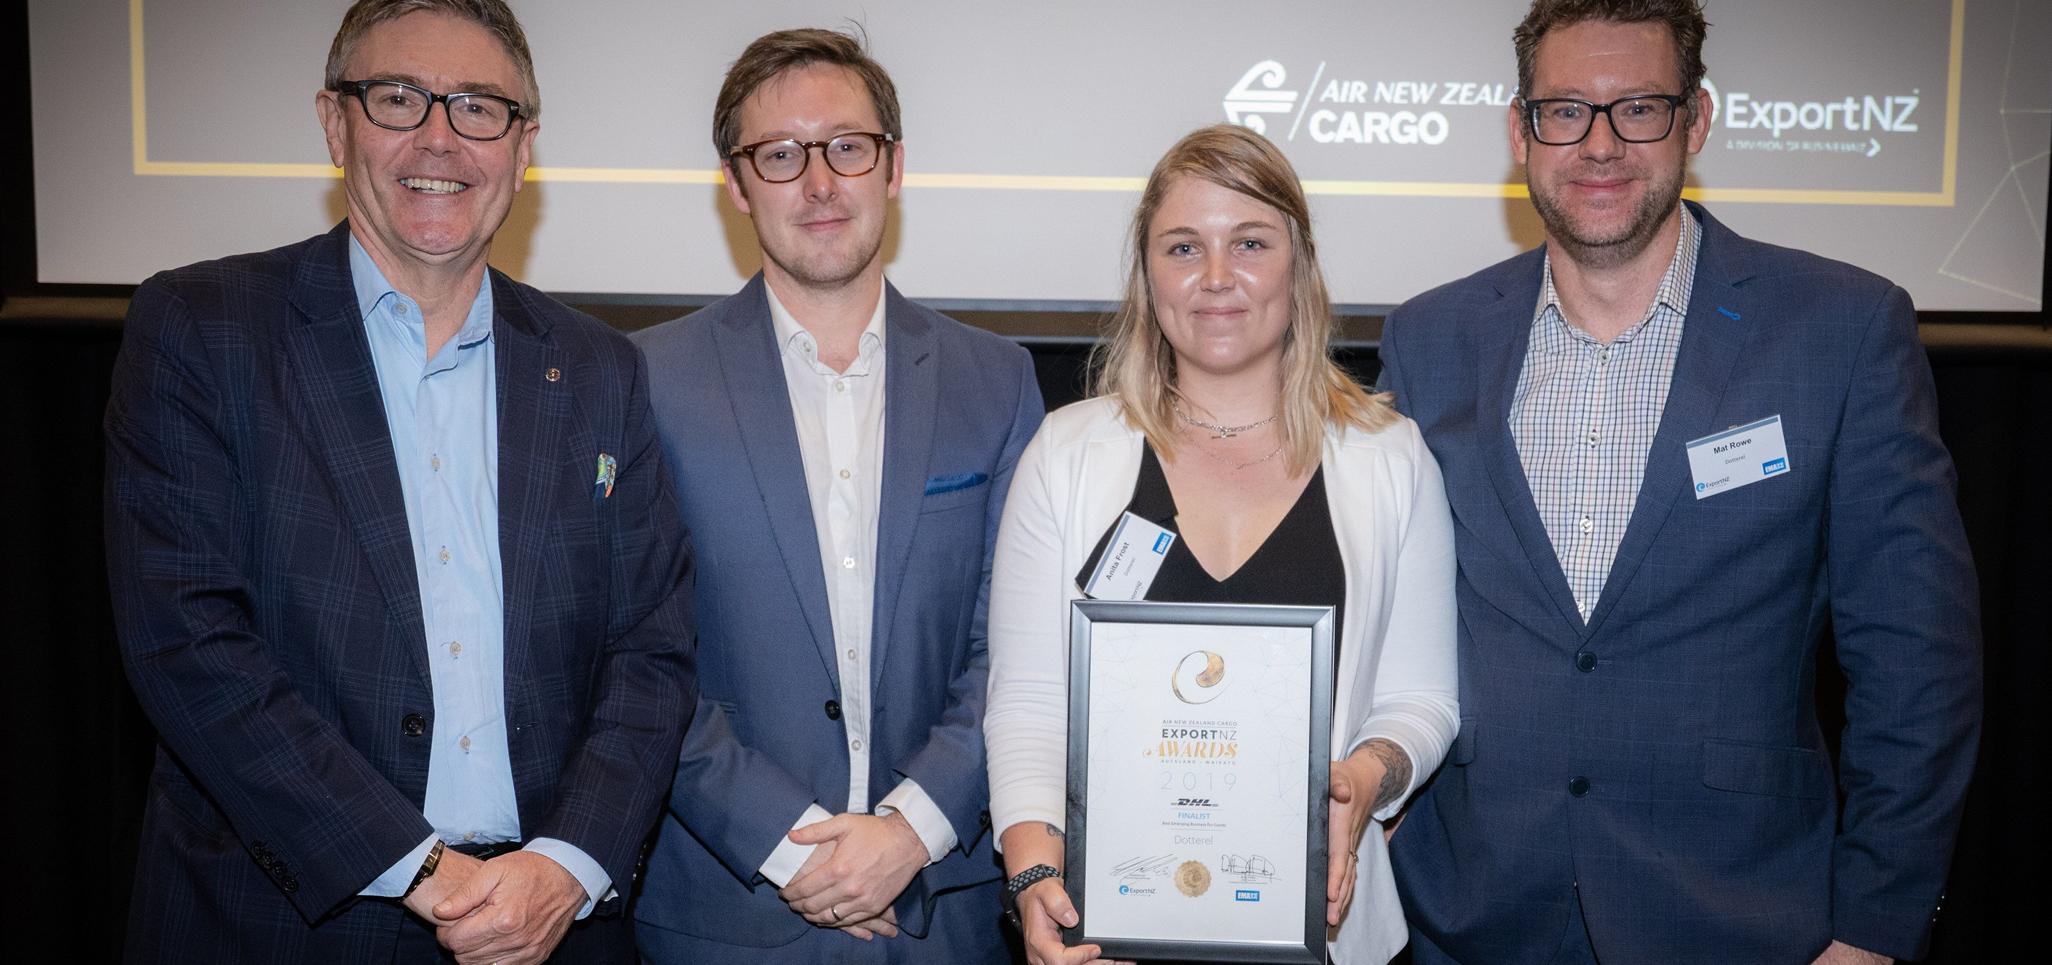 Dotterel announced as finalist in NZ Export Awards